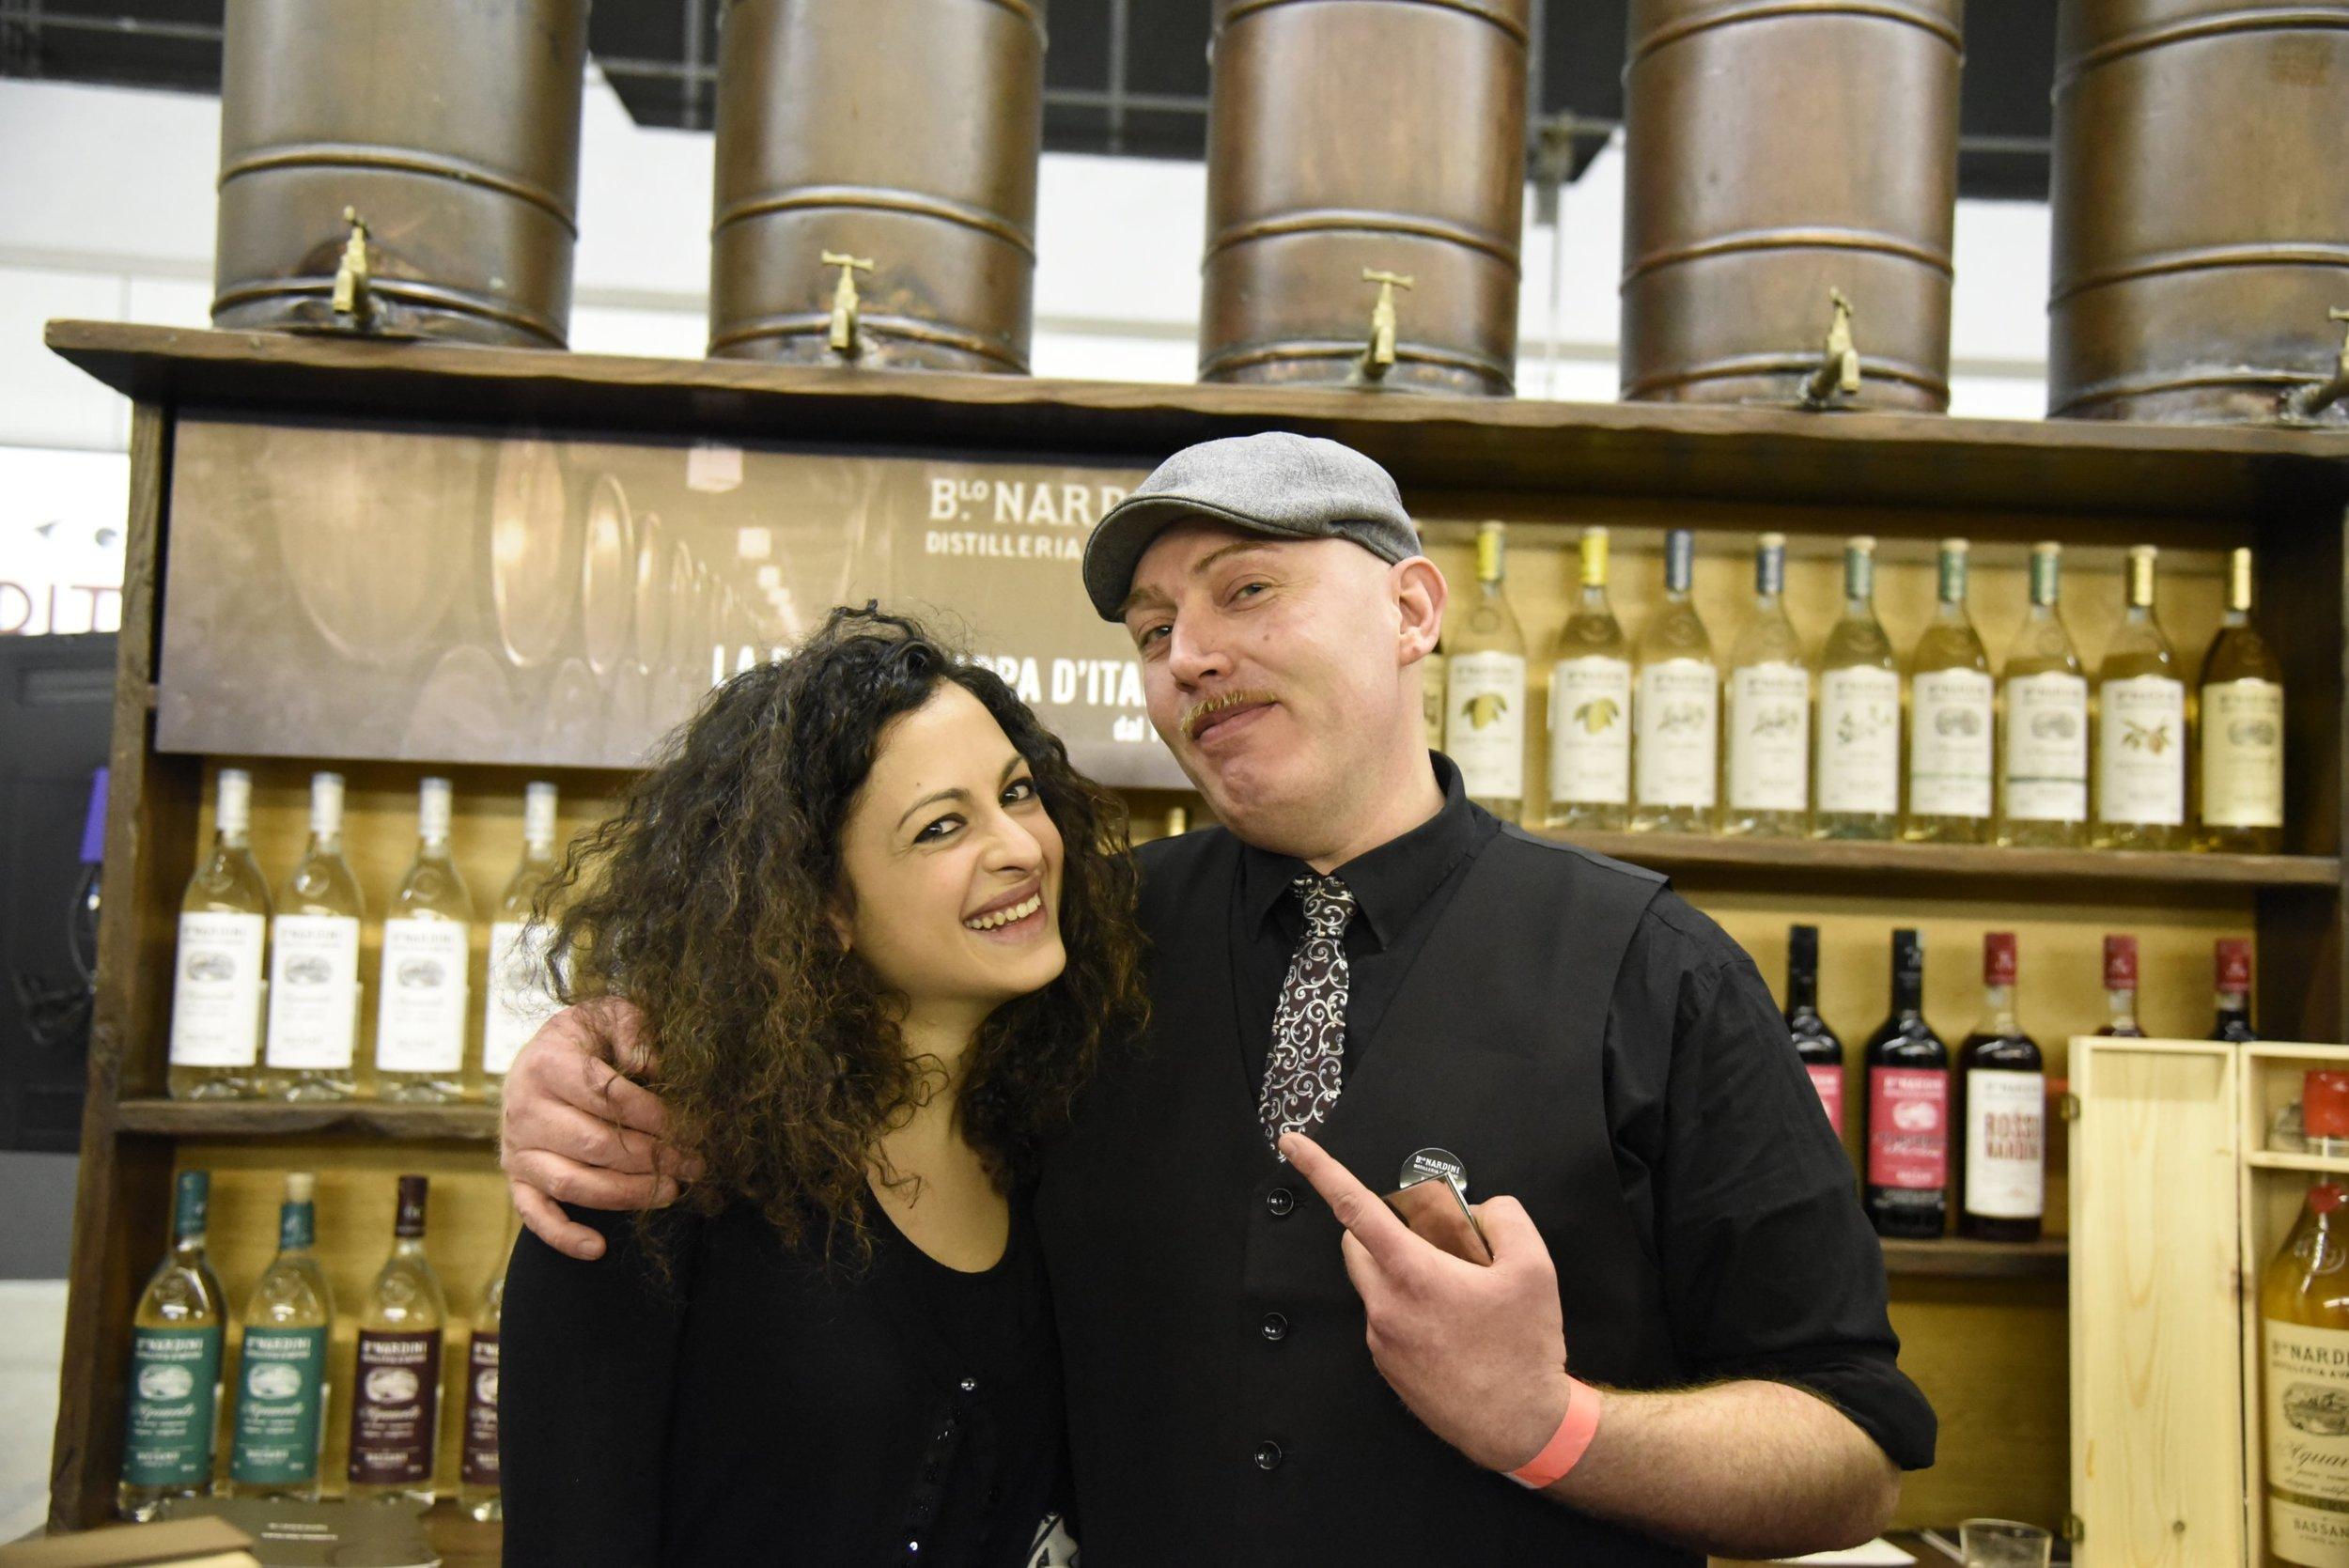 Mauro Uva with Nardini grappe